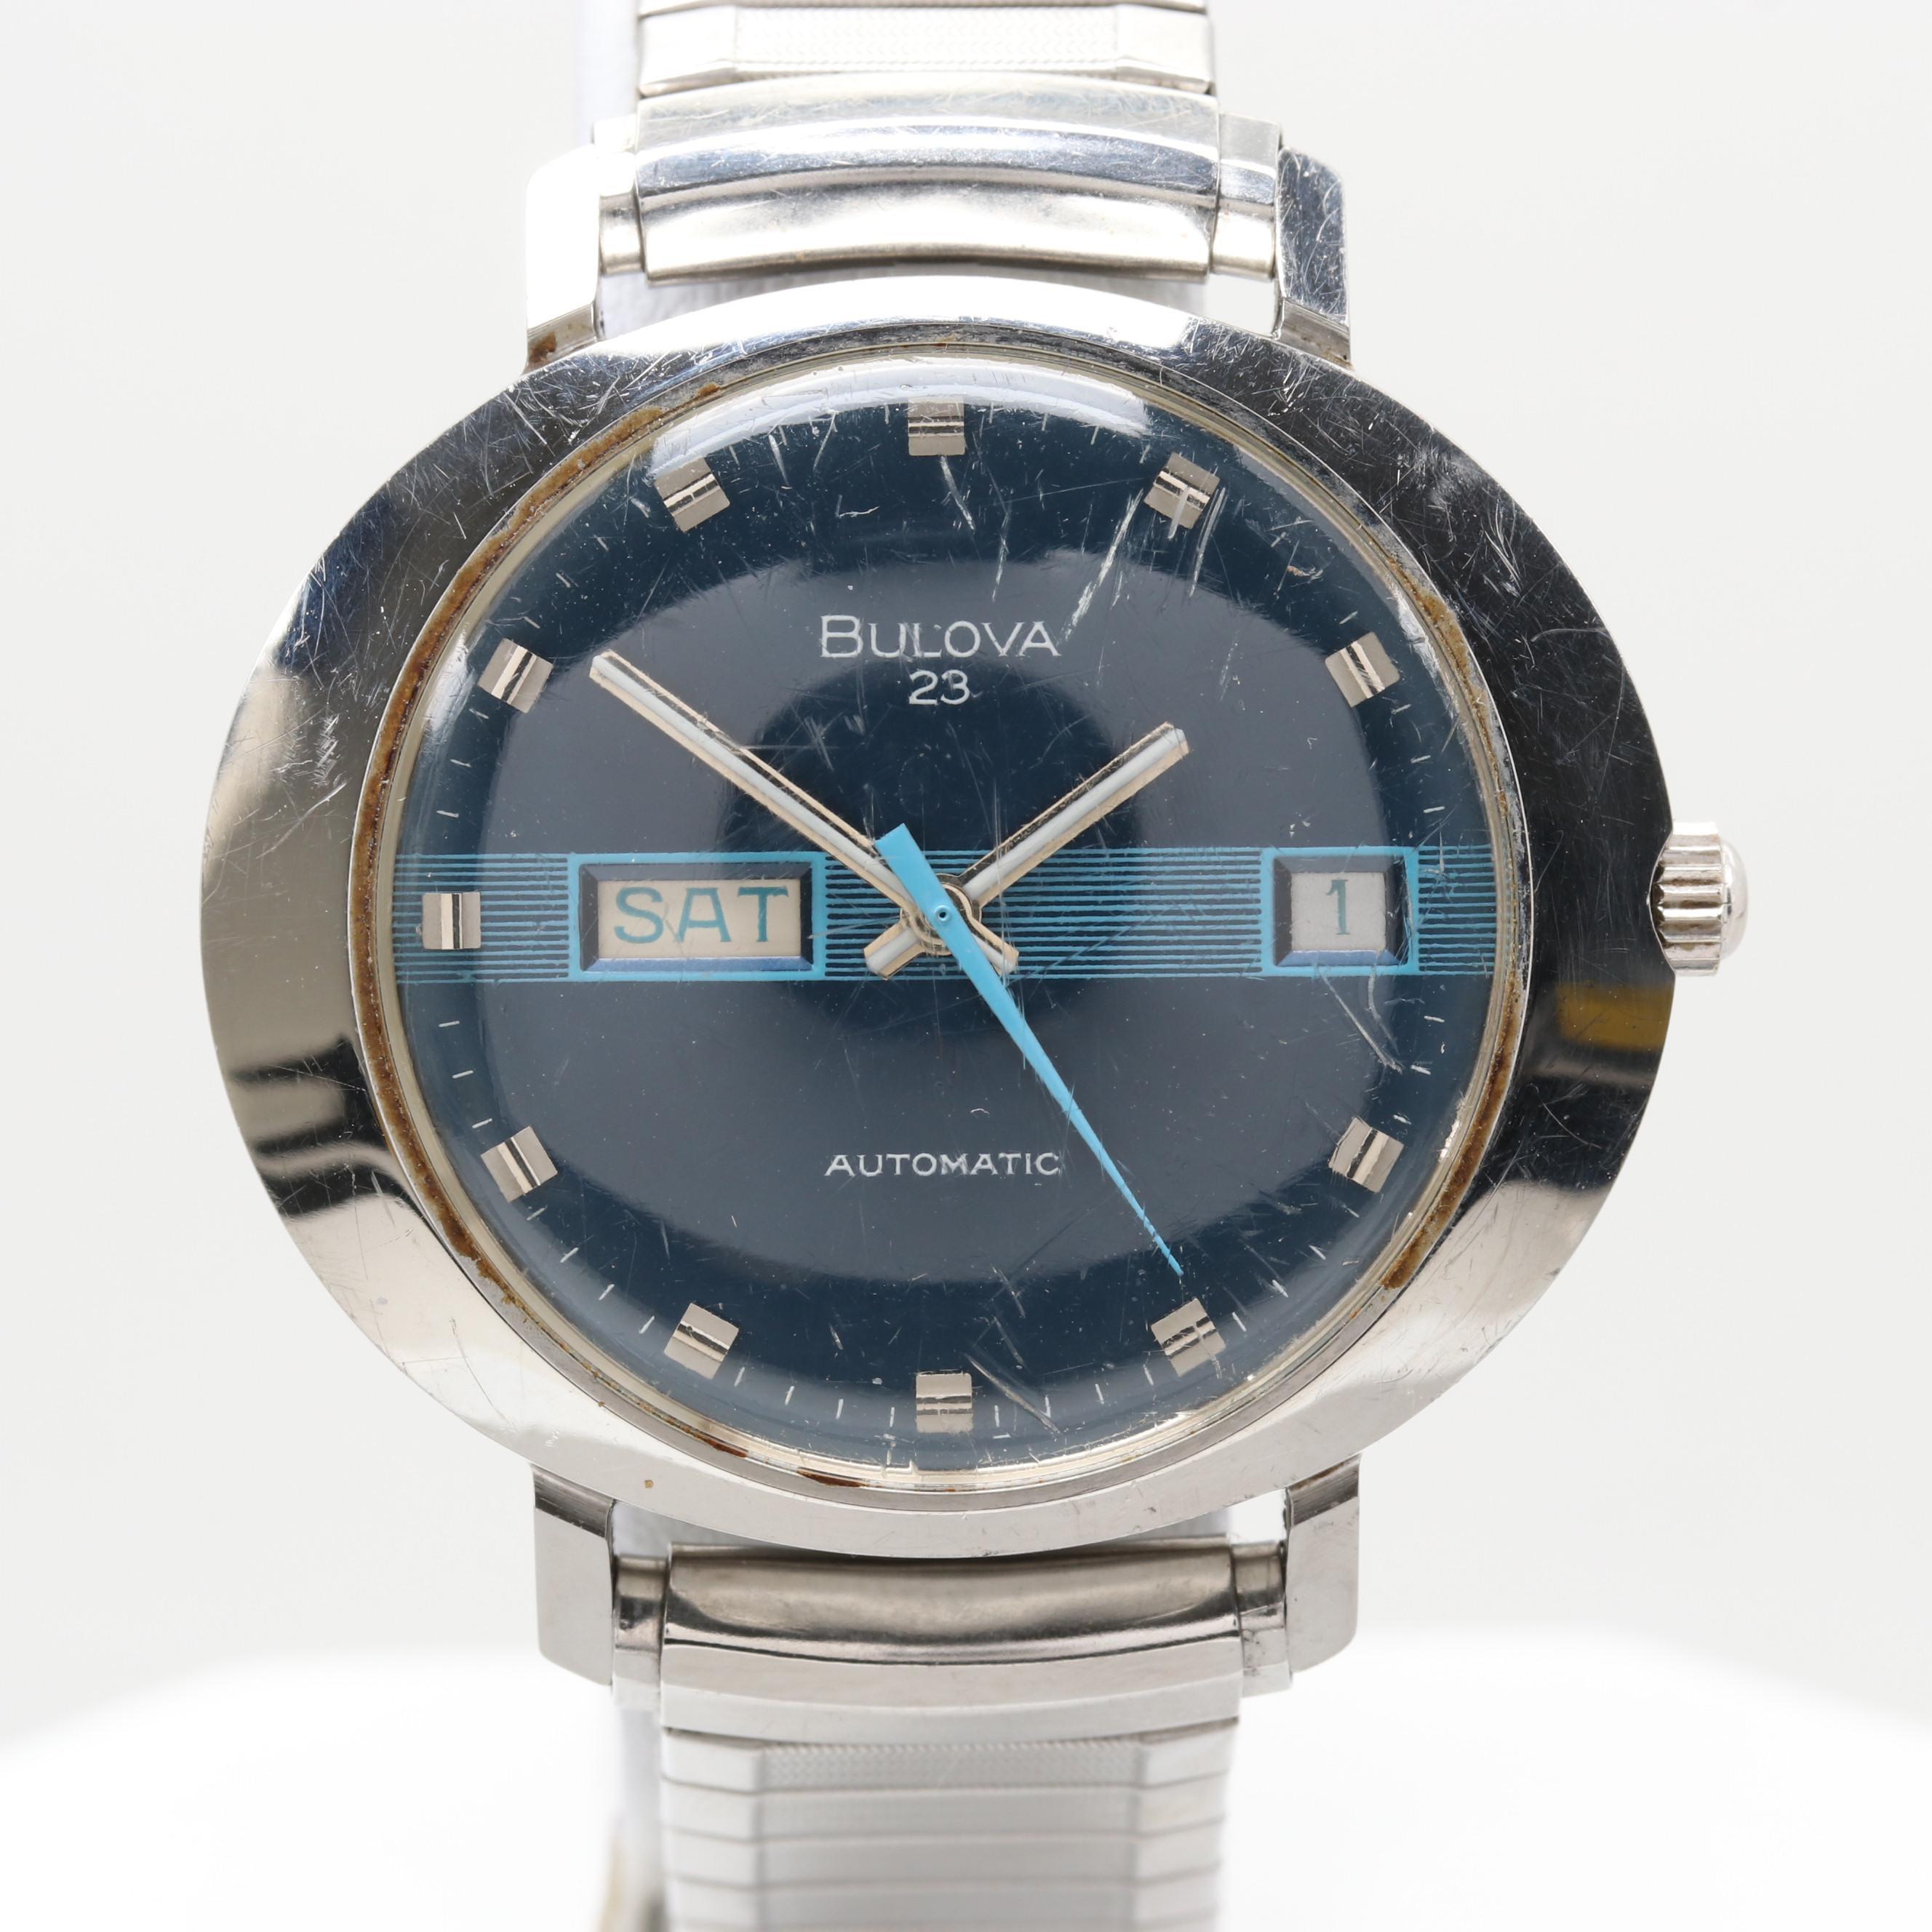 Bulova Stainless Steel Day/Date Wristwatch